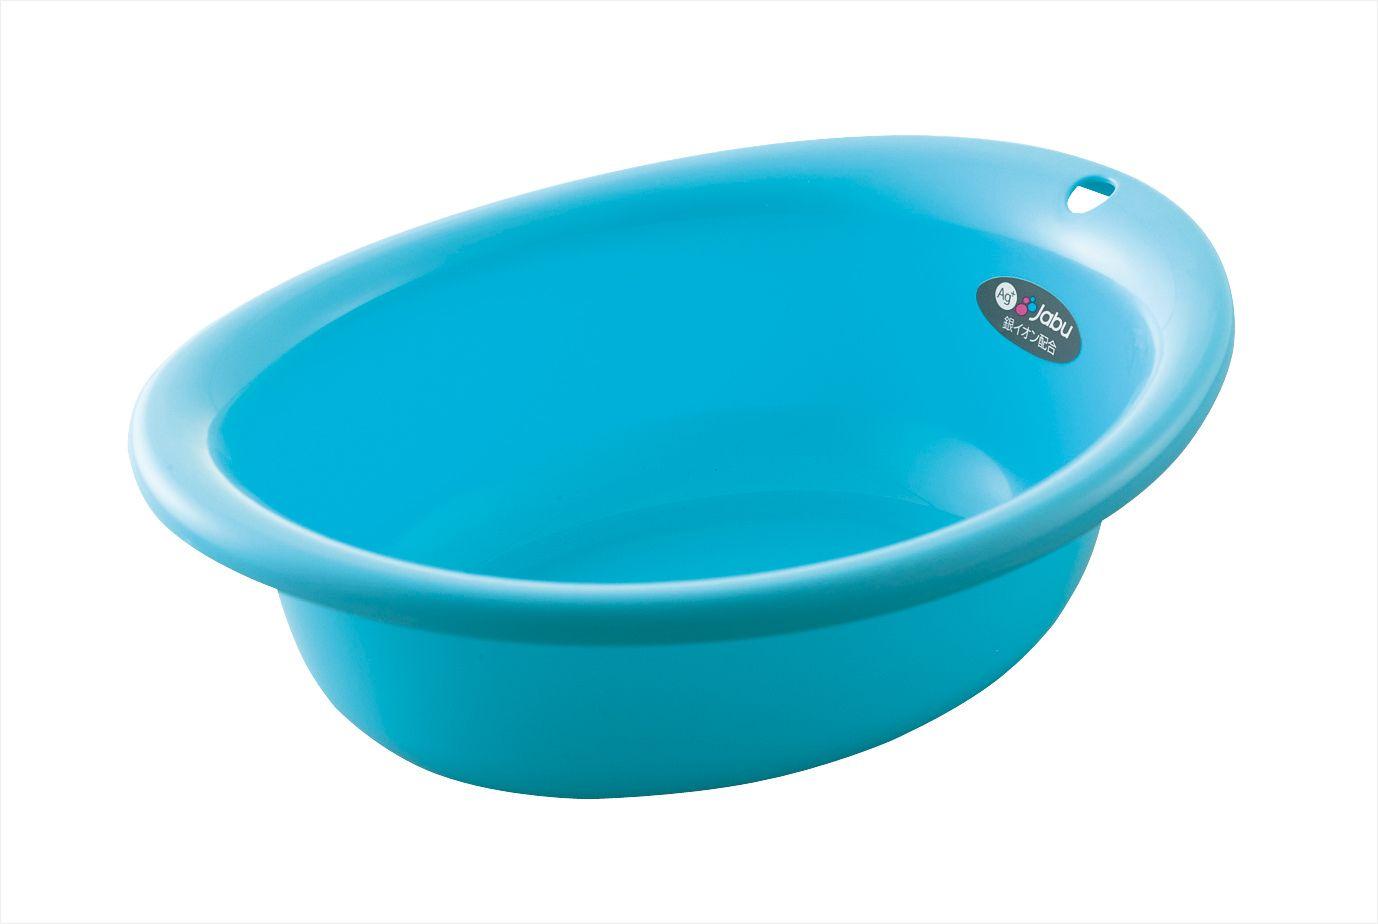 sanada日本椭圆形水盆2.2L(蓝色)